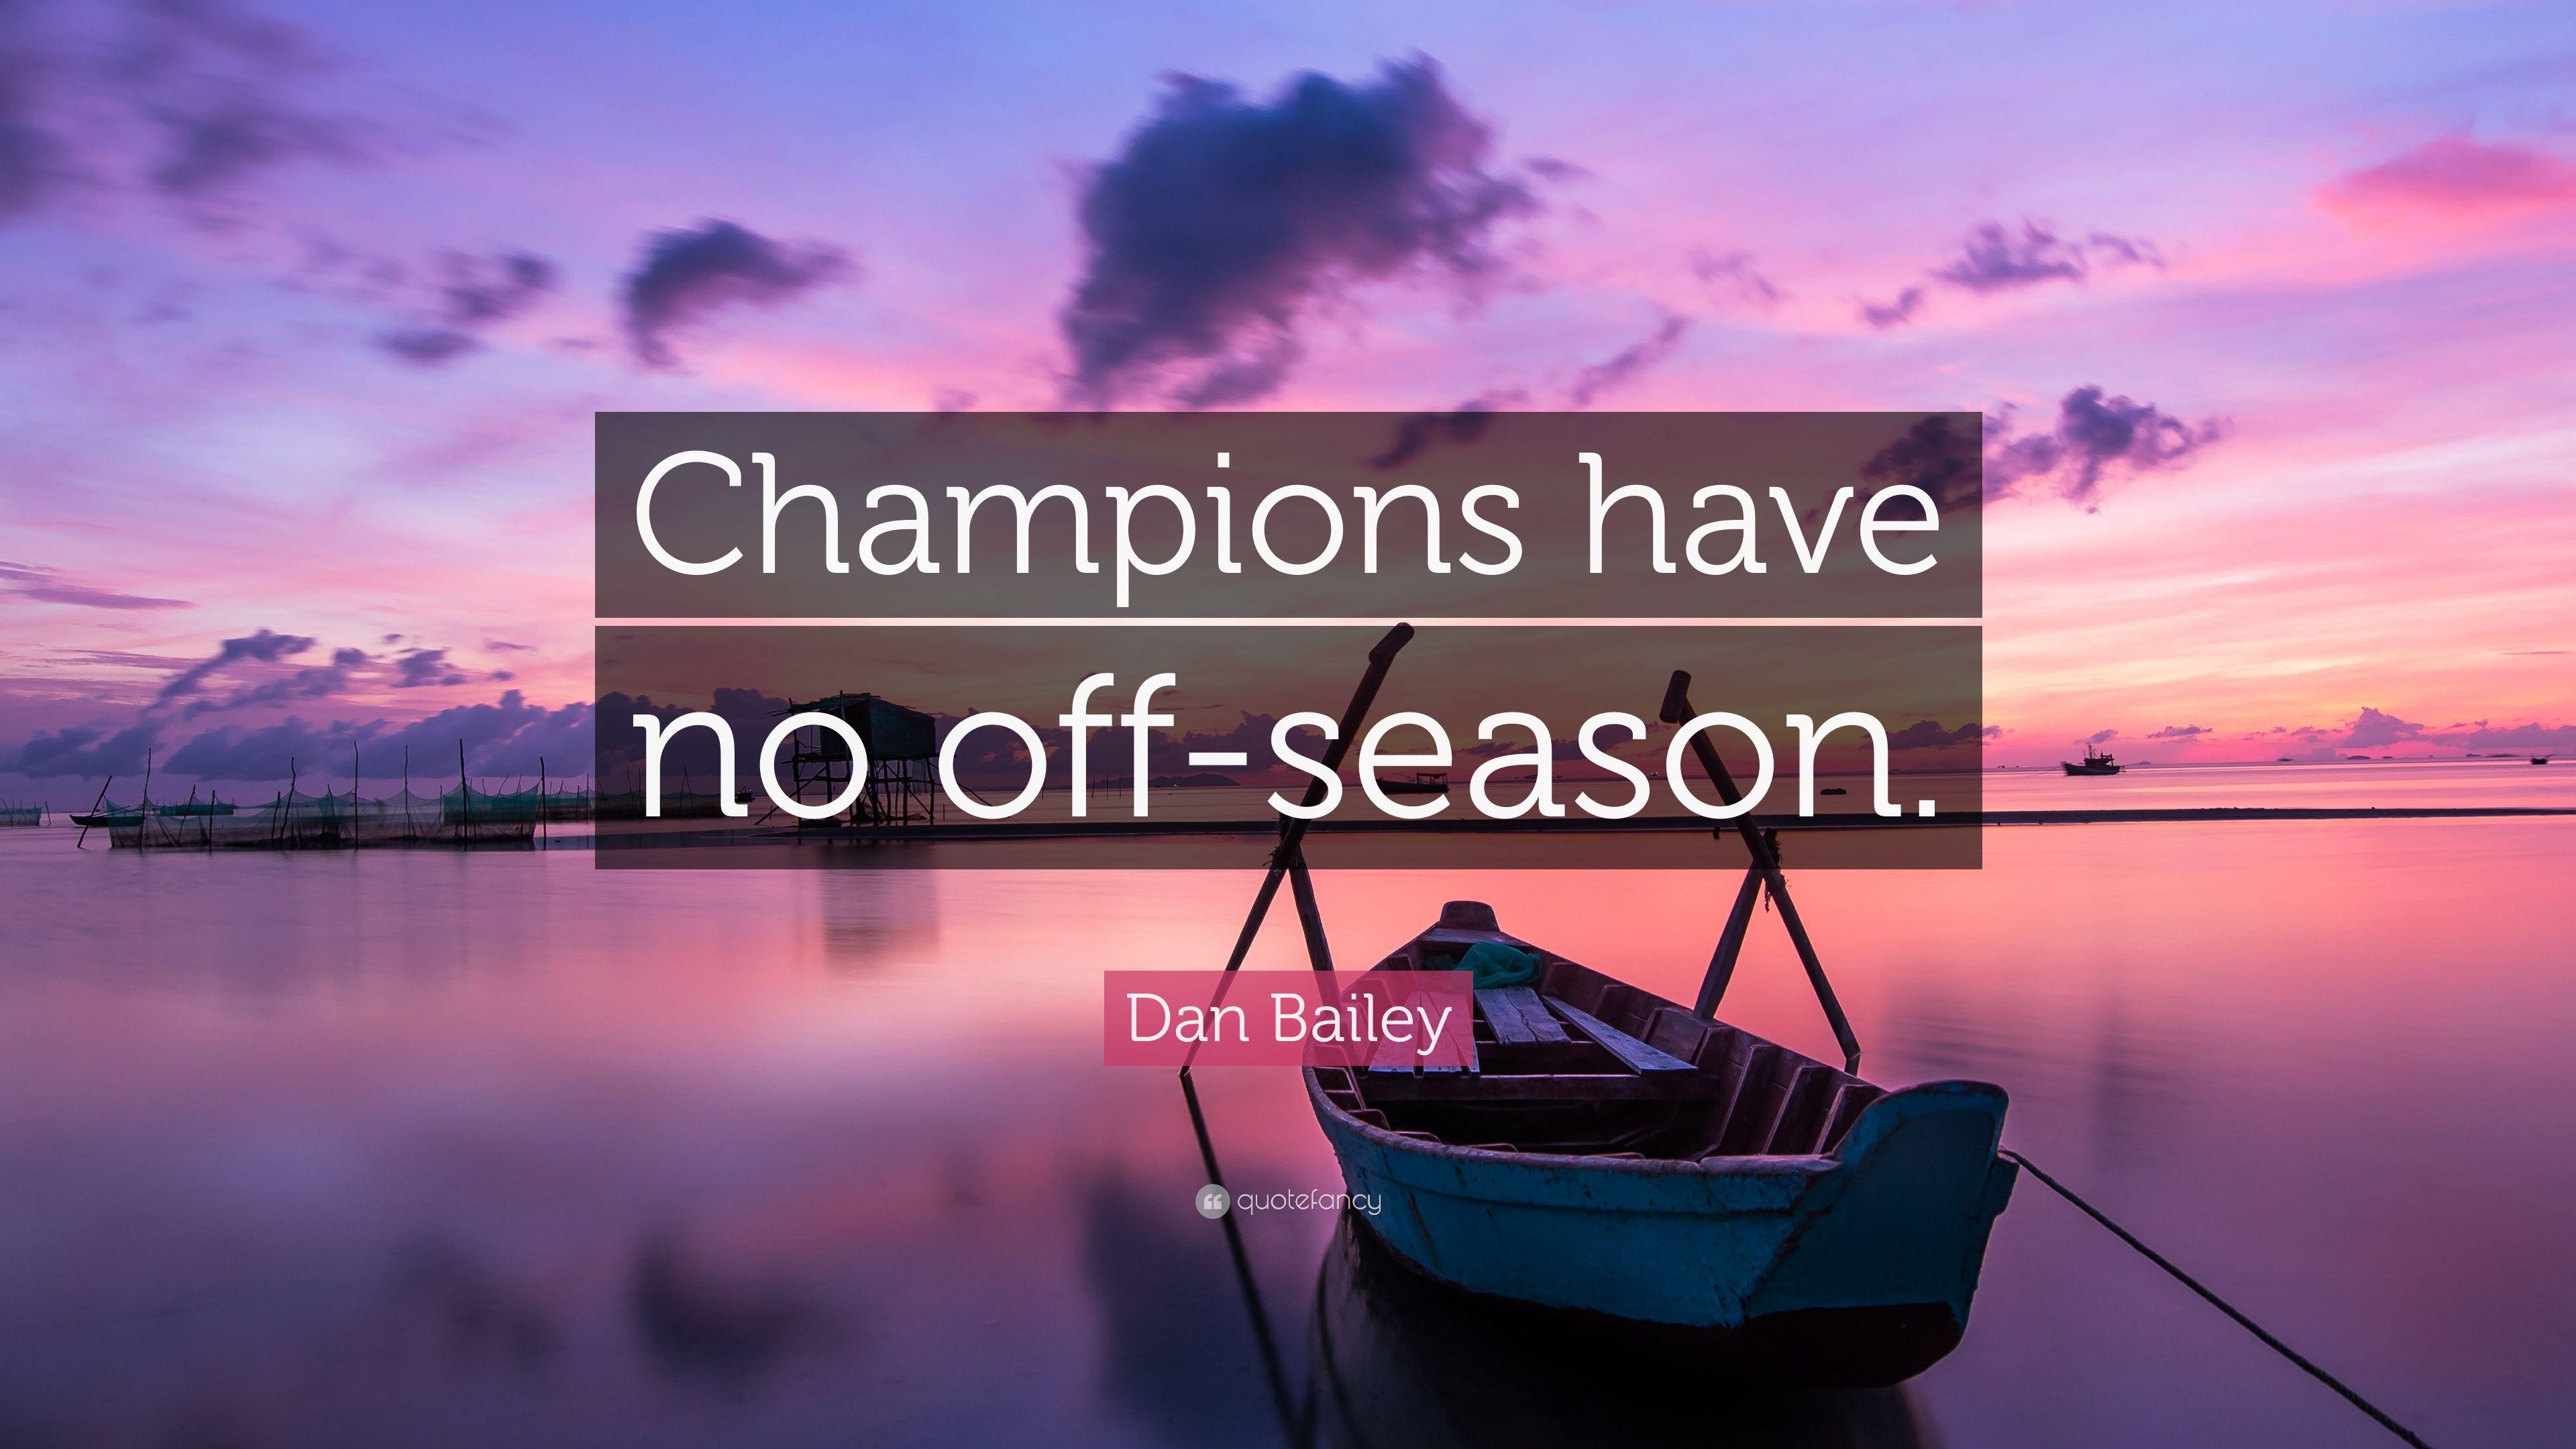 2145165-Dan-Bailey-Quote-Champions-have-no-off-season